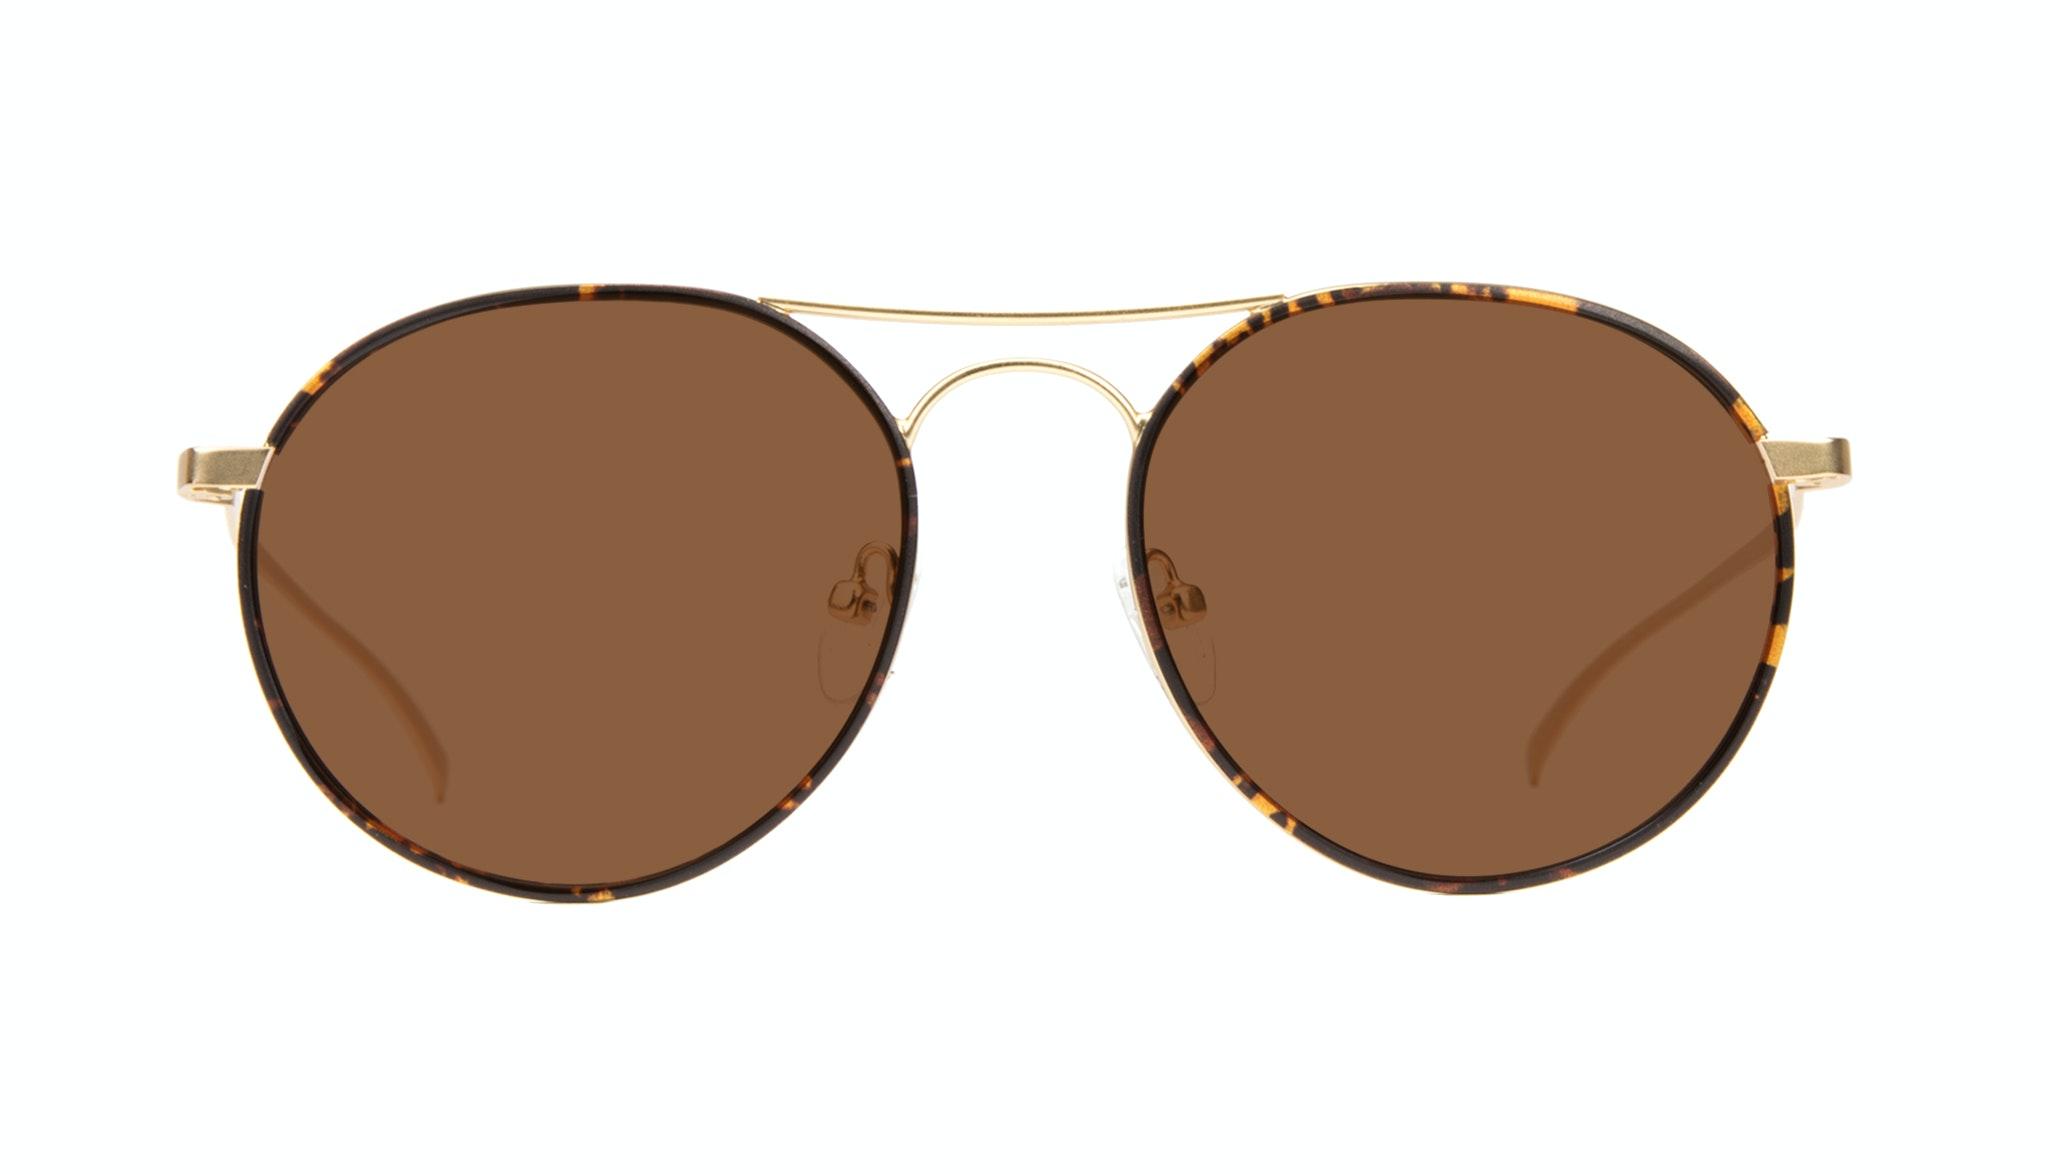 Affordable Fashion Glasses Aviator Round Sunglasses Men Contour Tortoise